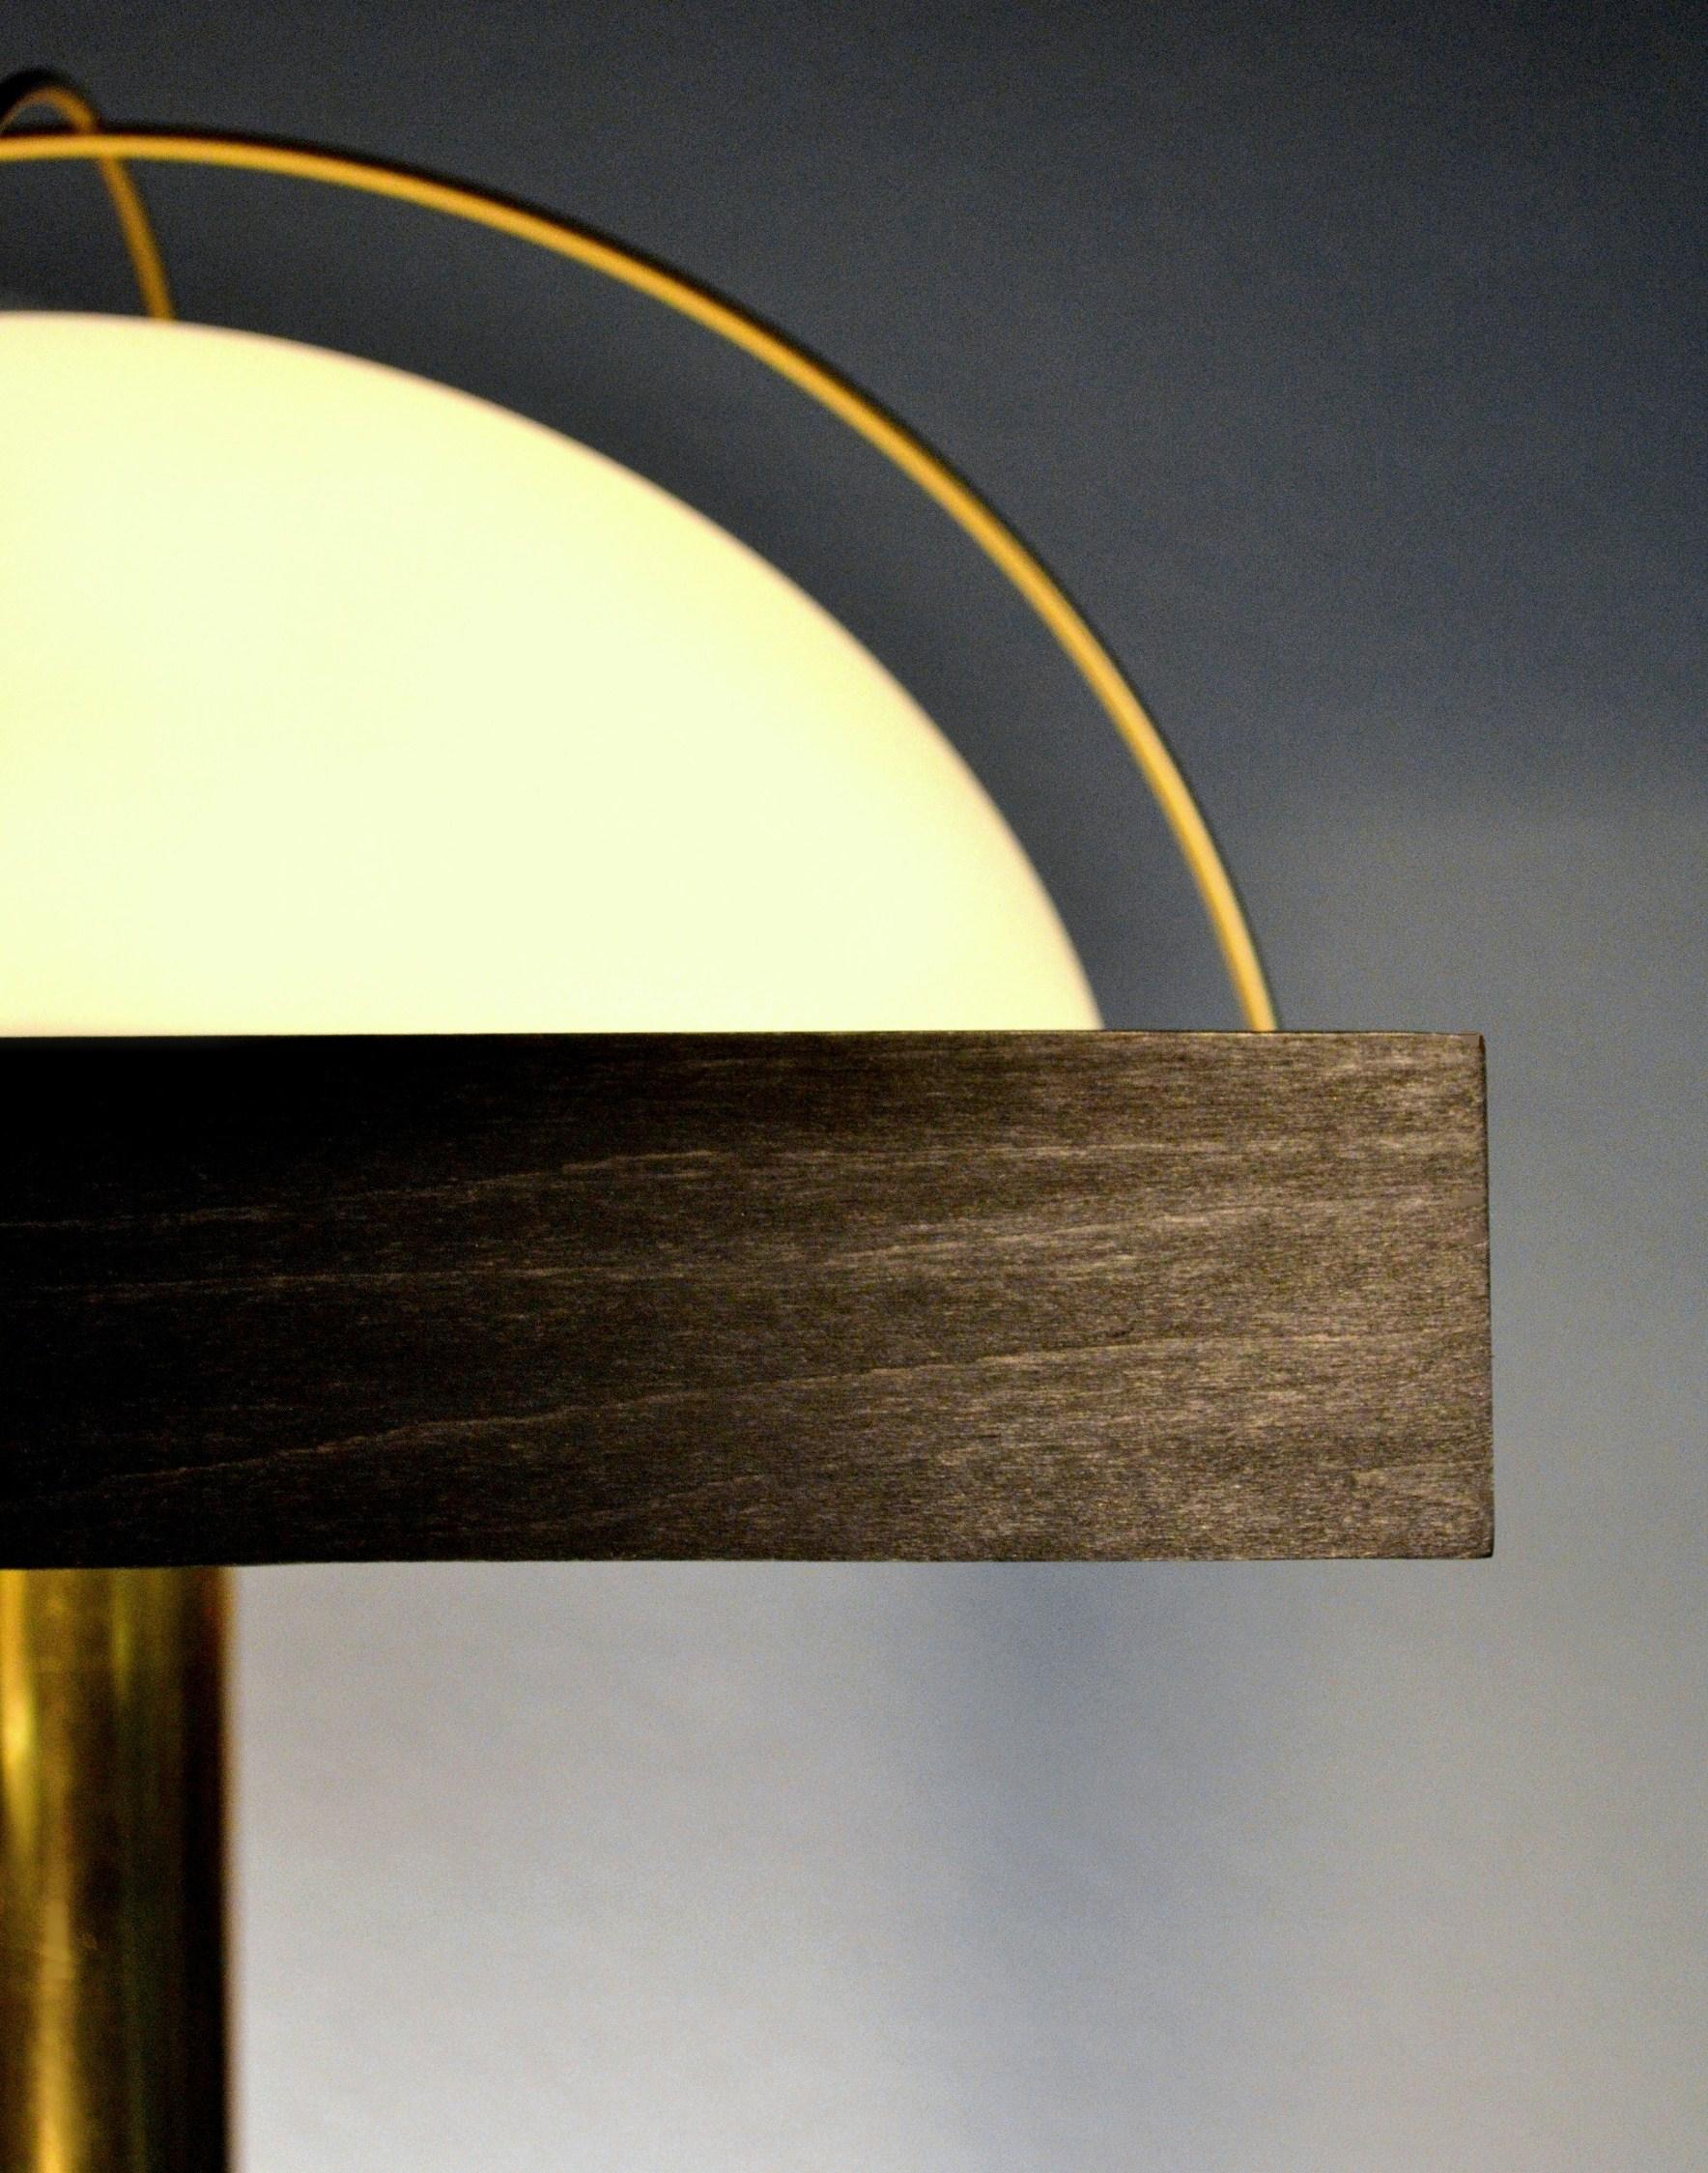 Revisiting My Mid Century Roots Bauhaus Inspired Lighting